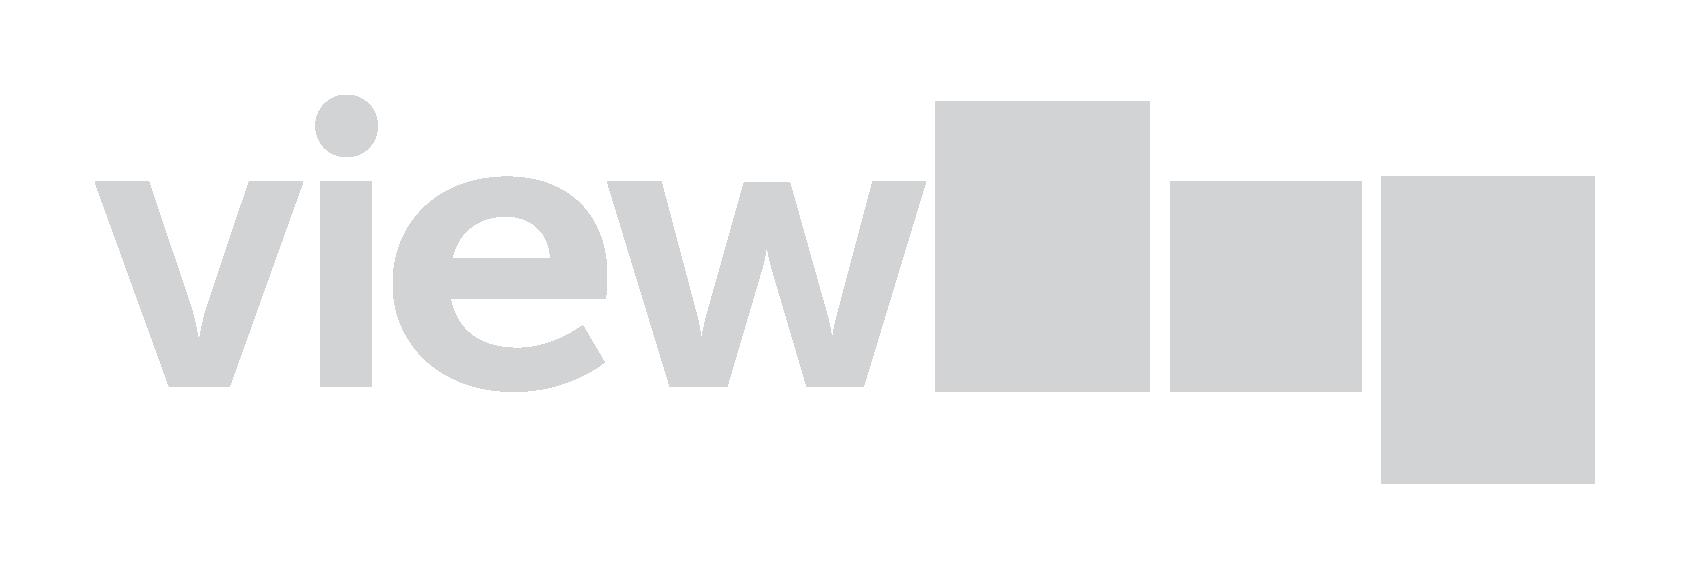 ViewBug_Logo_CMYK300dpi_BLACK.png